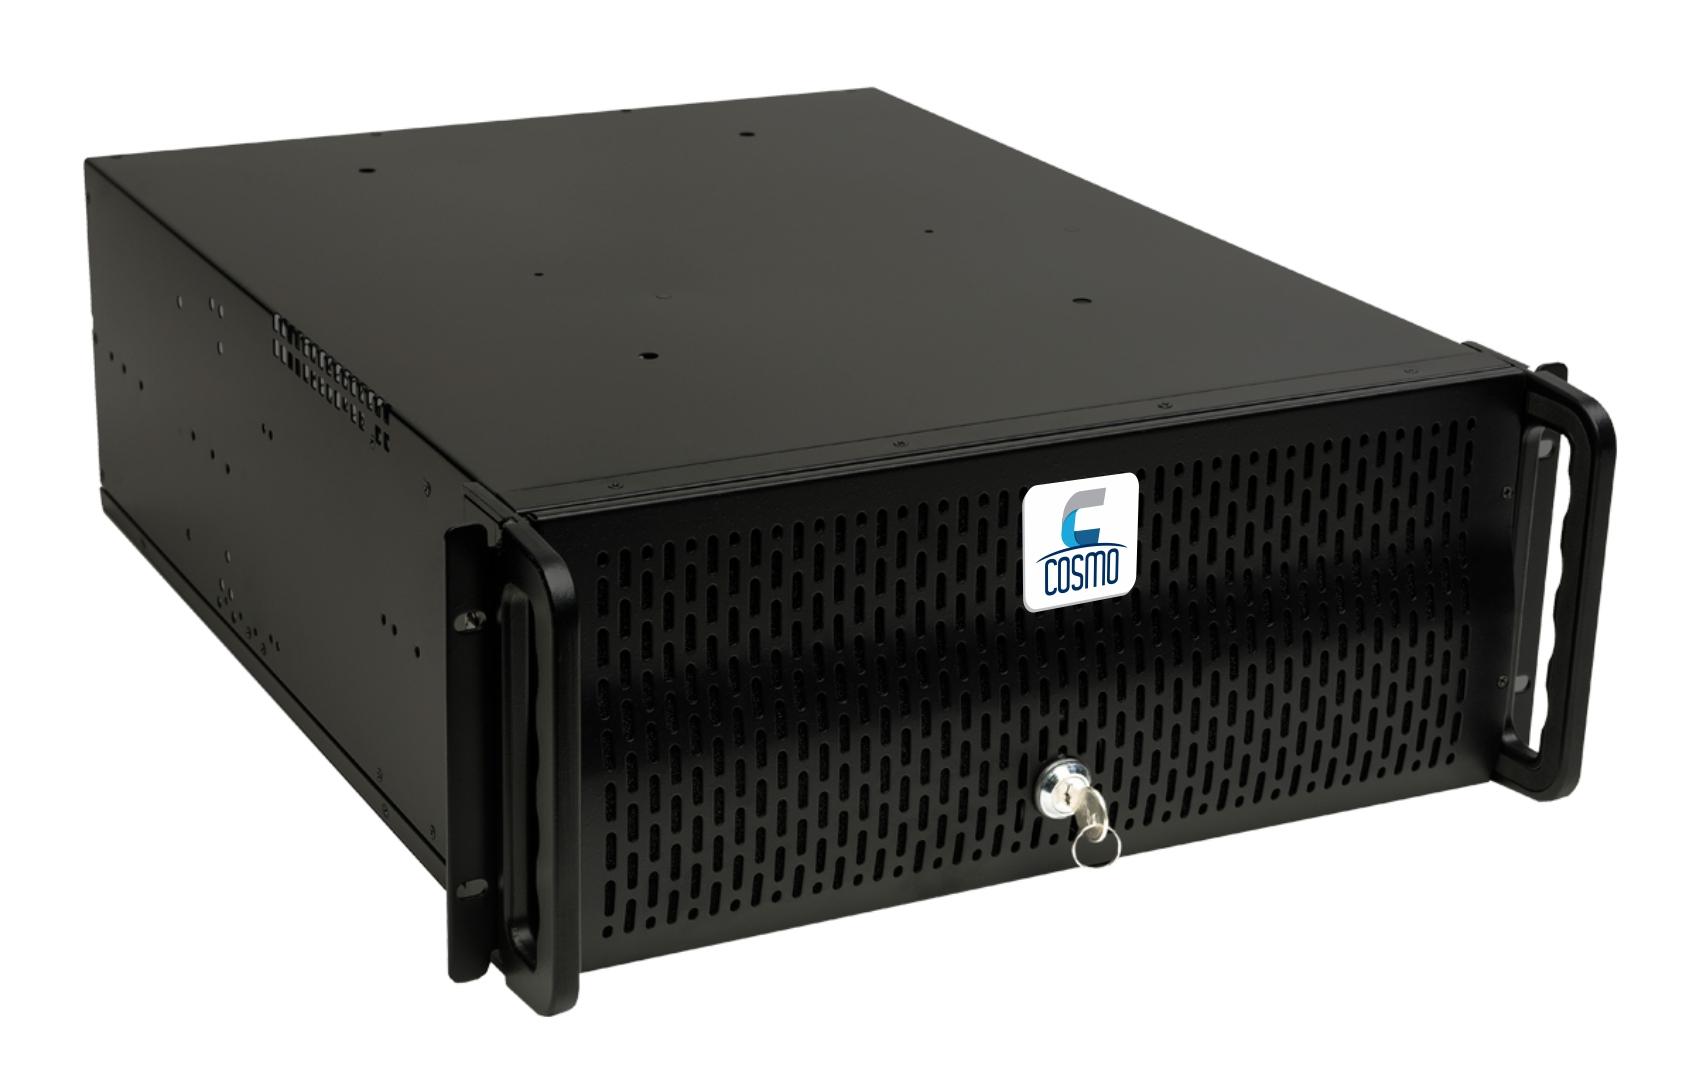 COSMO Server 4U